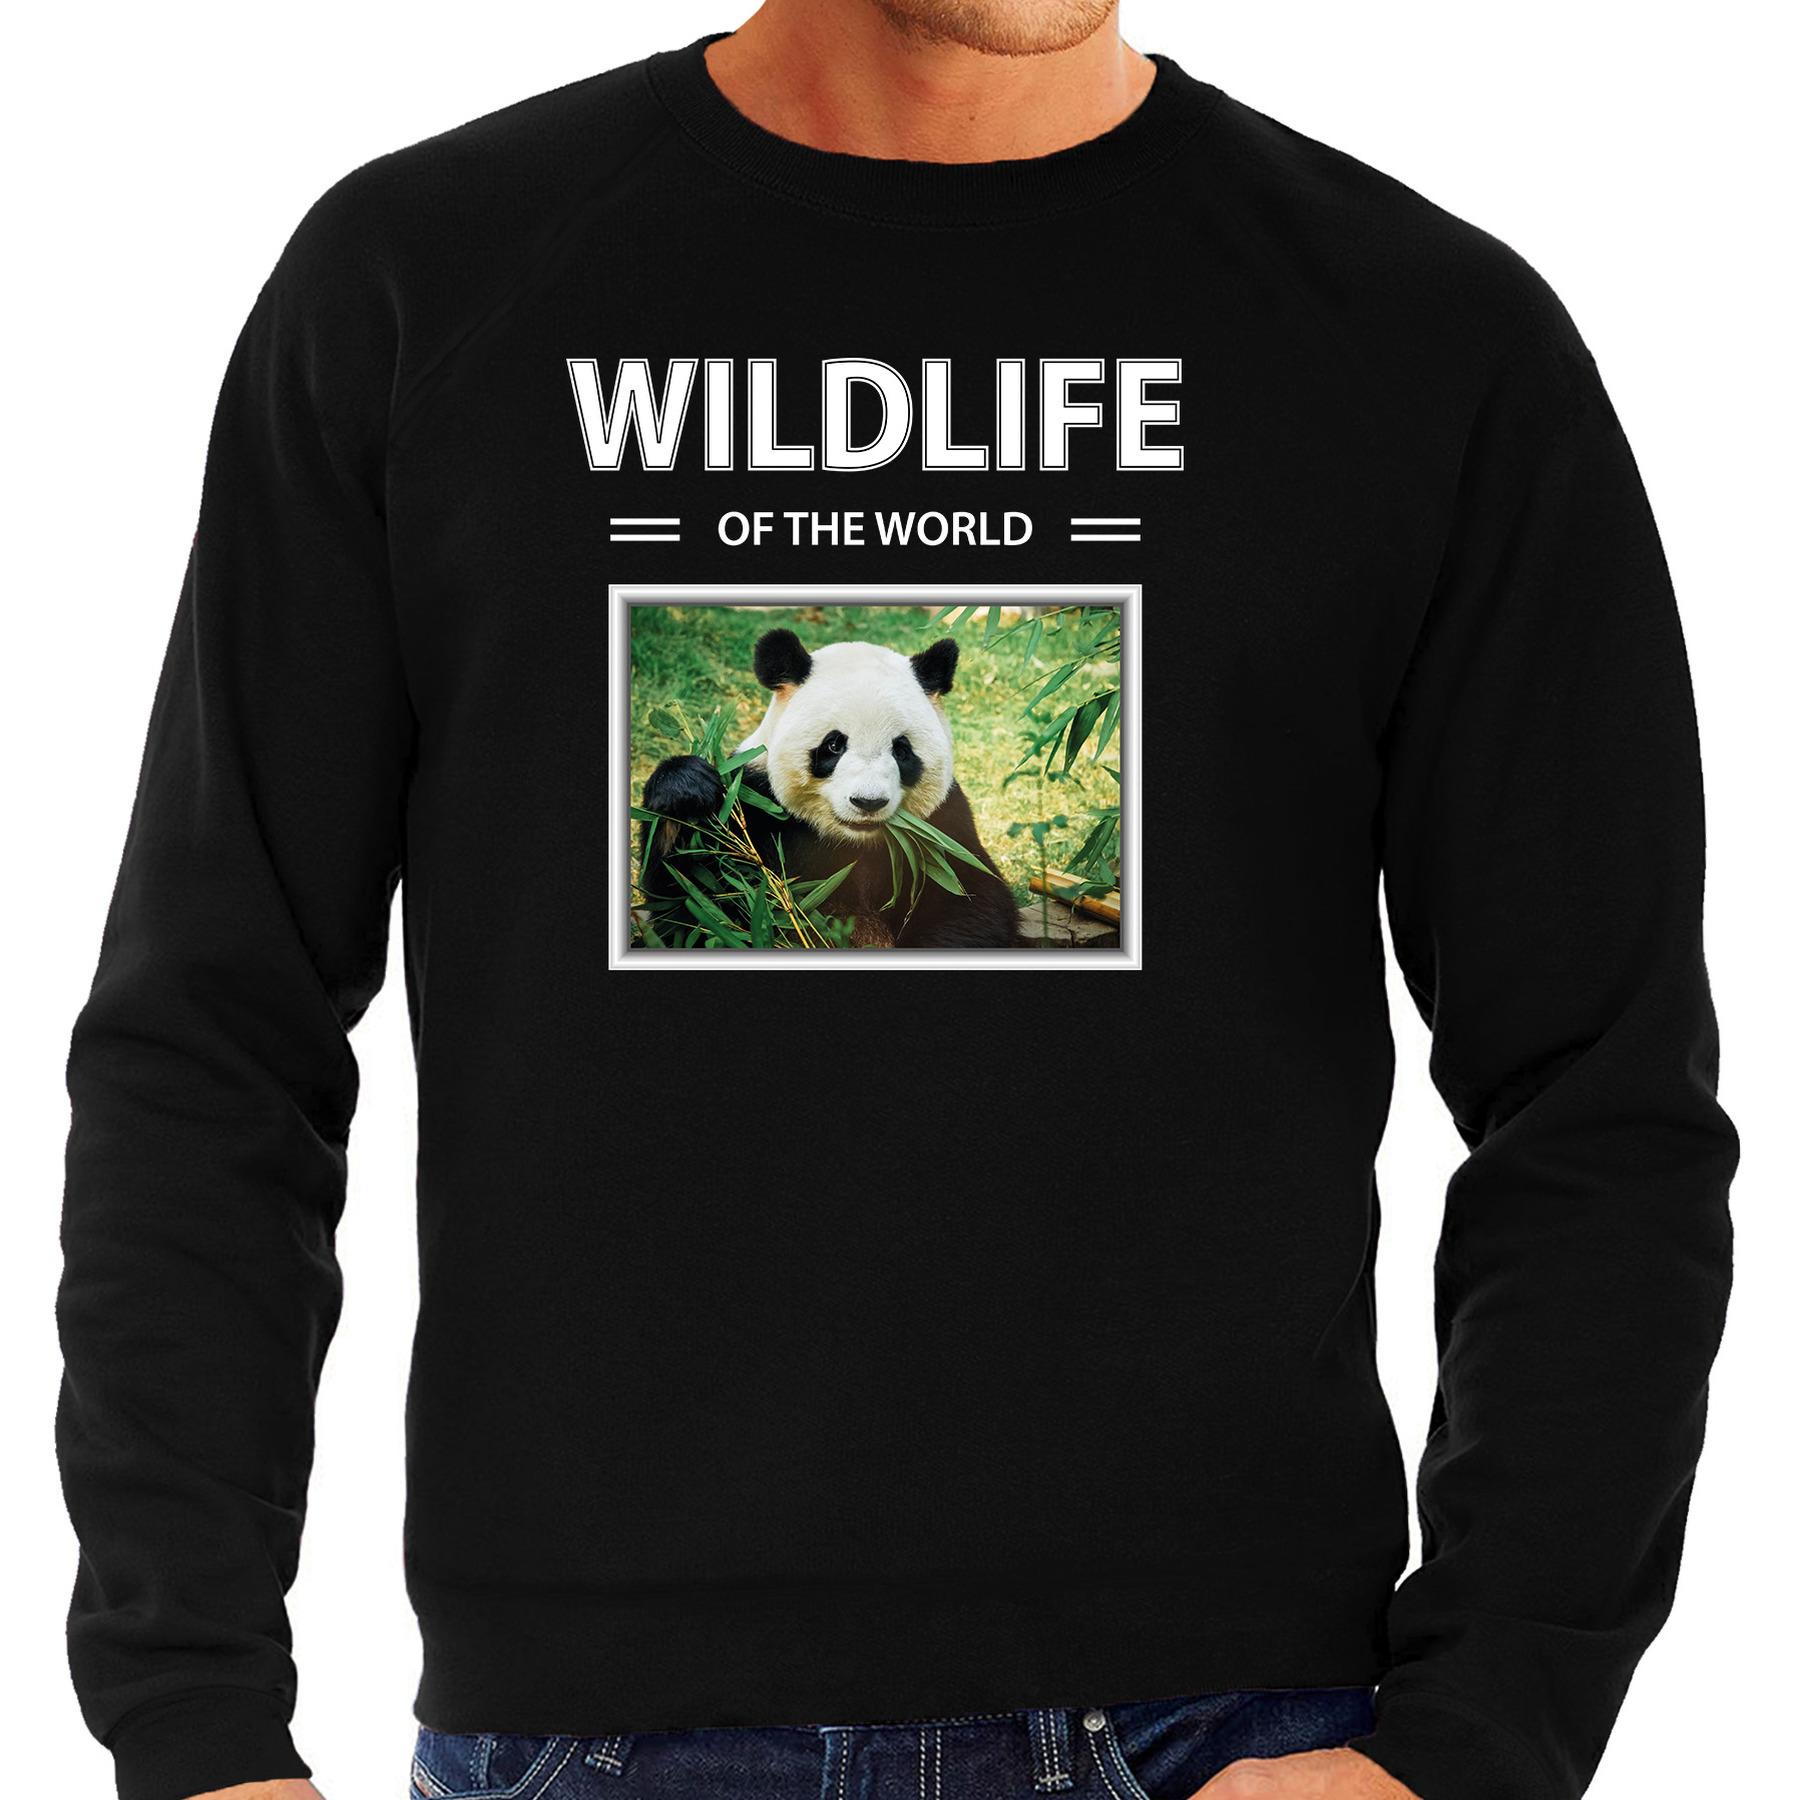 Panda foto sweater zwart voor heren - wildlife of the world cadeau trui Pandas liefhebber